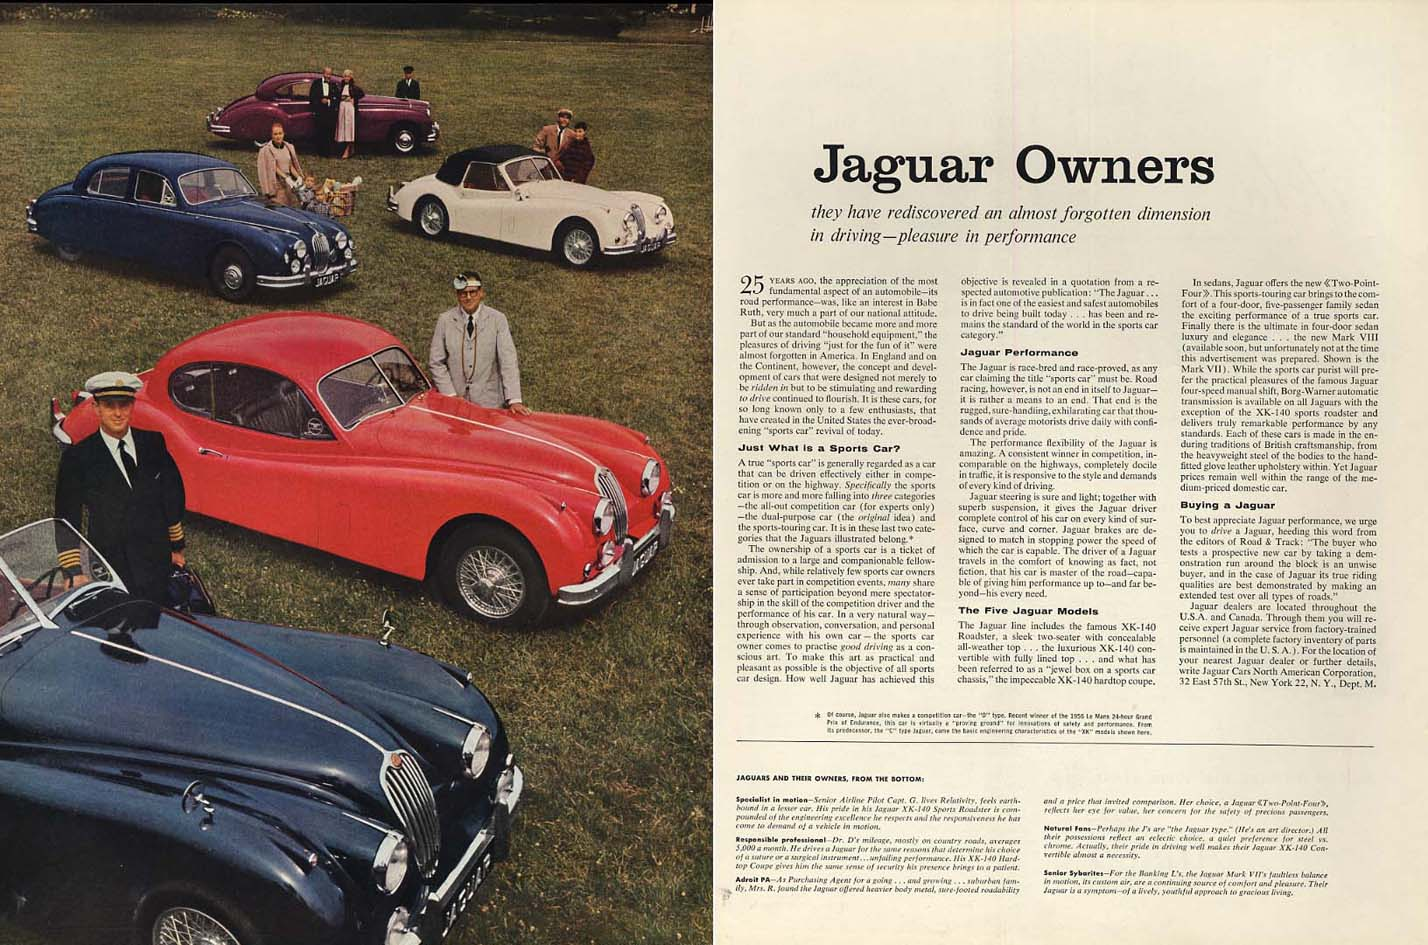 The almost forgotten dimension in driving Jaguar XK-140 & Mark VII ad 1957 H